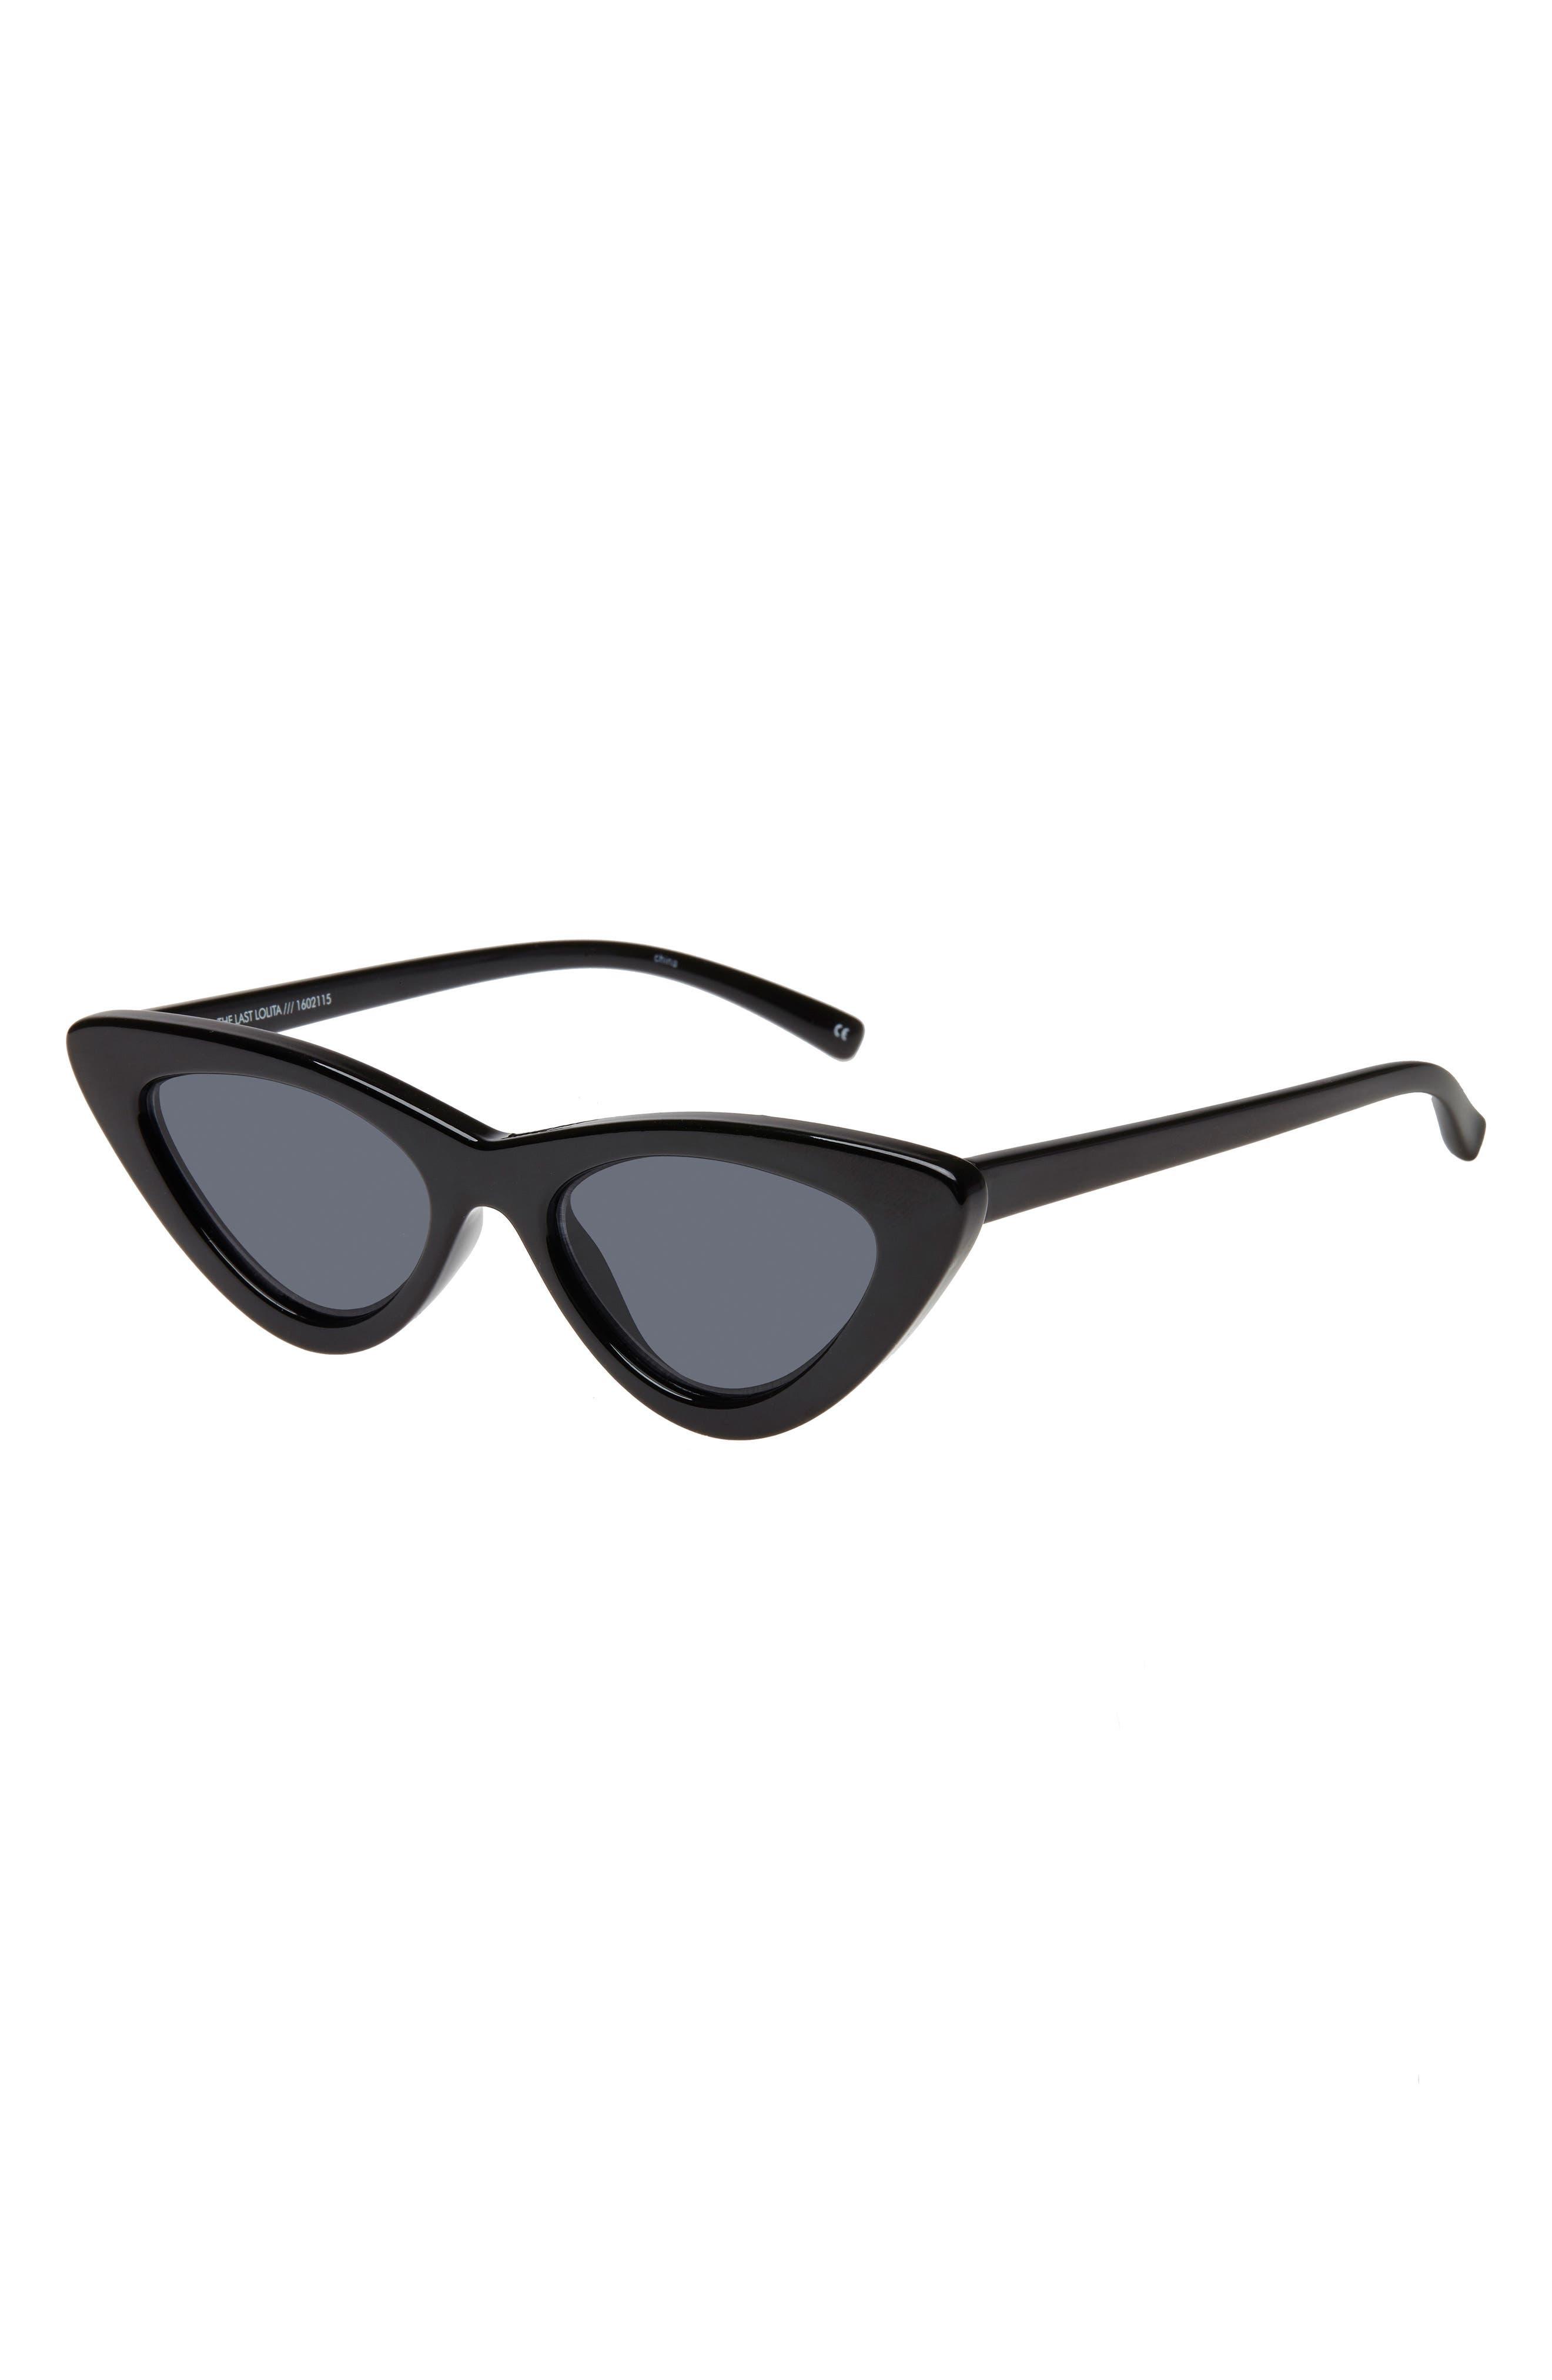 ADAM SELMAN X LE SPECS LUXE, Lolita 49mm Cat Eye Sunglasses, Alternate thumbnail 2, color, BLACK